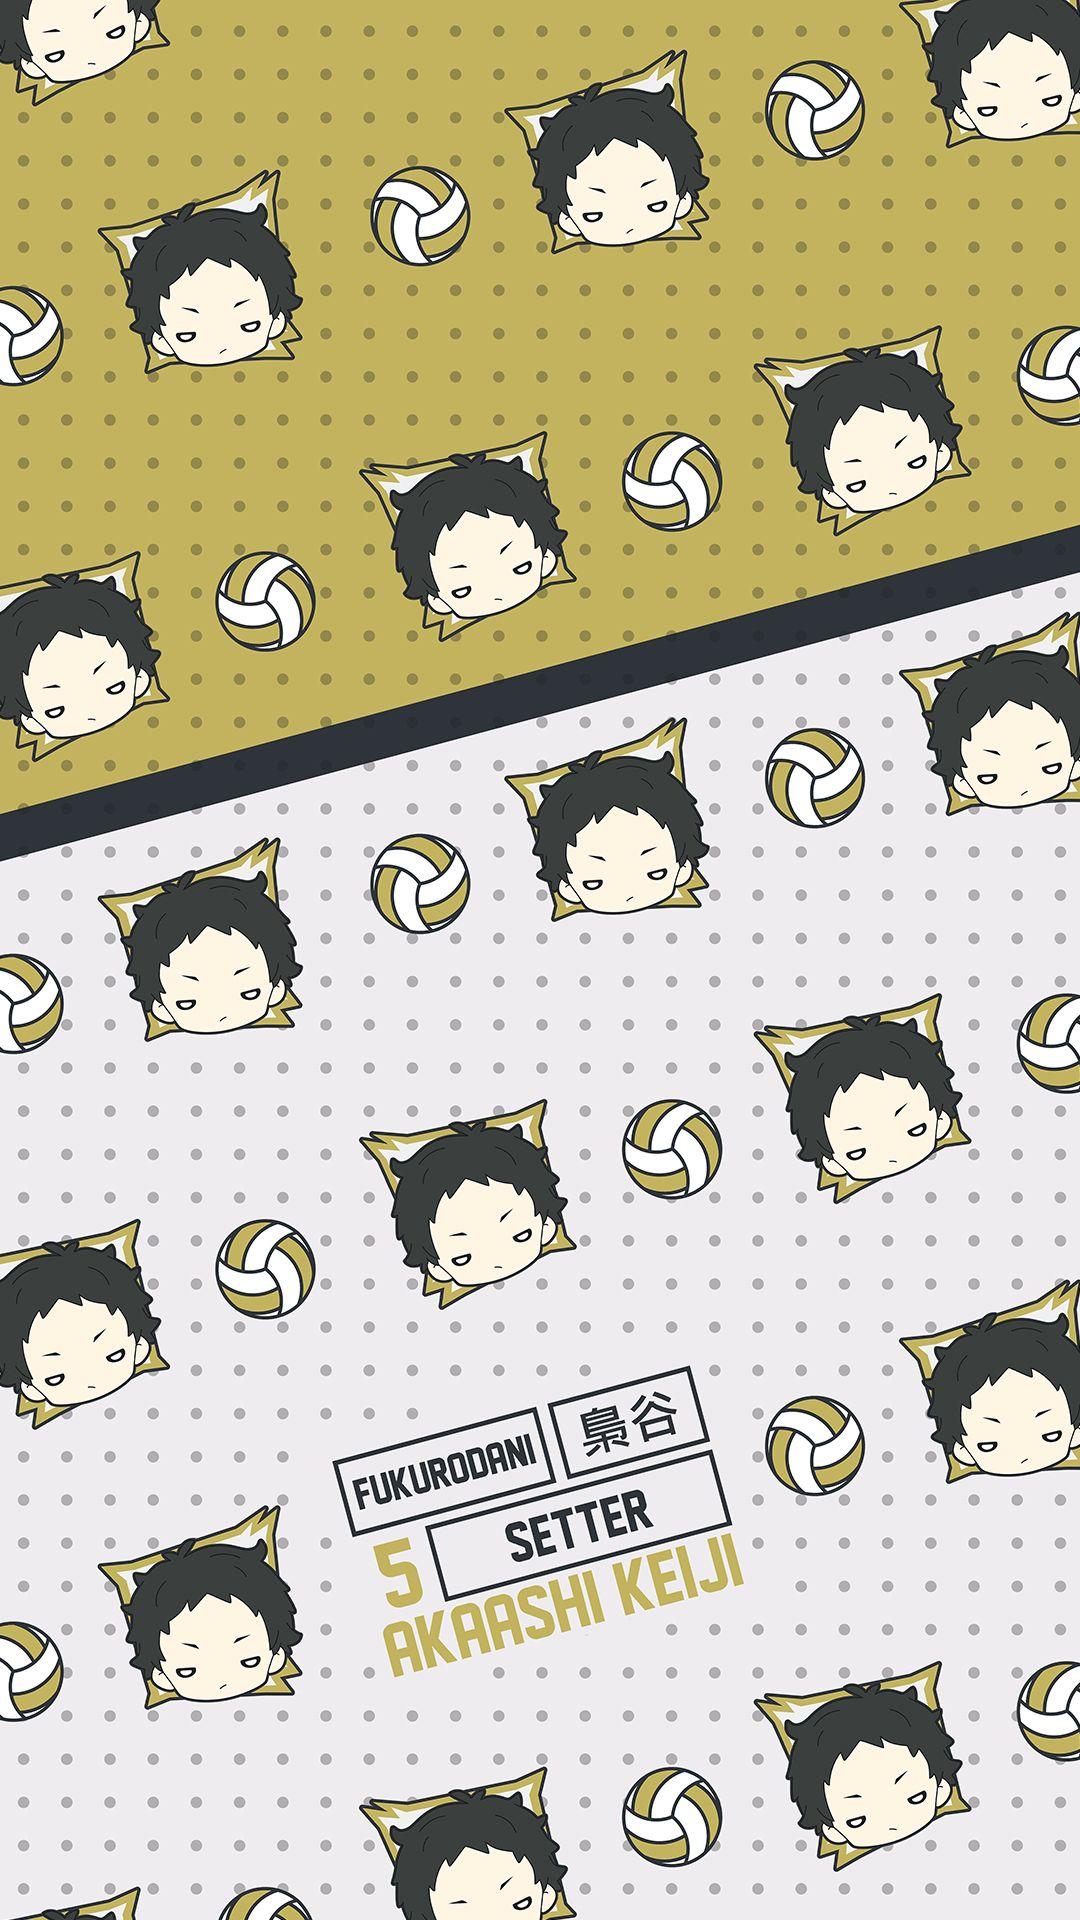 Akaashi Keiji - Fukurodani - Pattern - Wallpaper